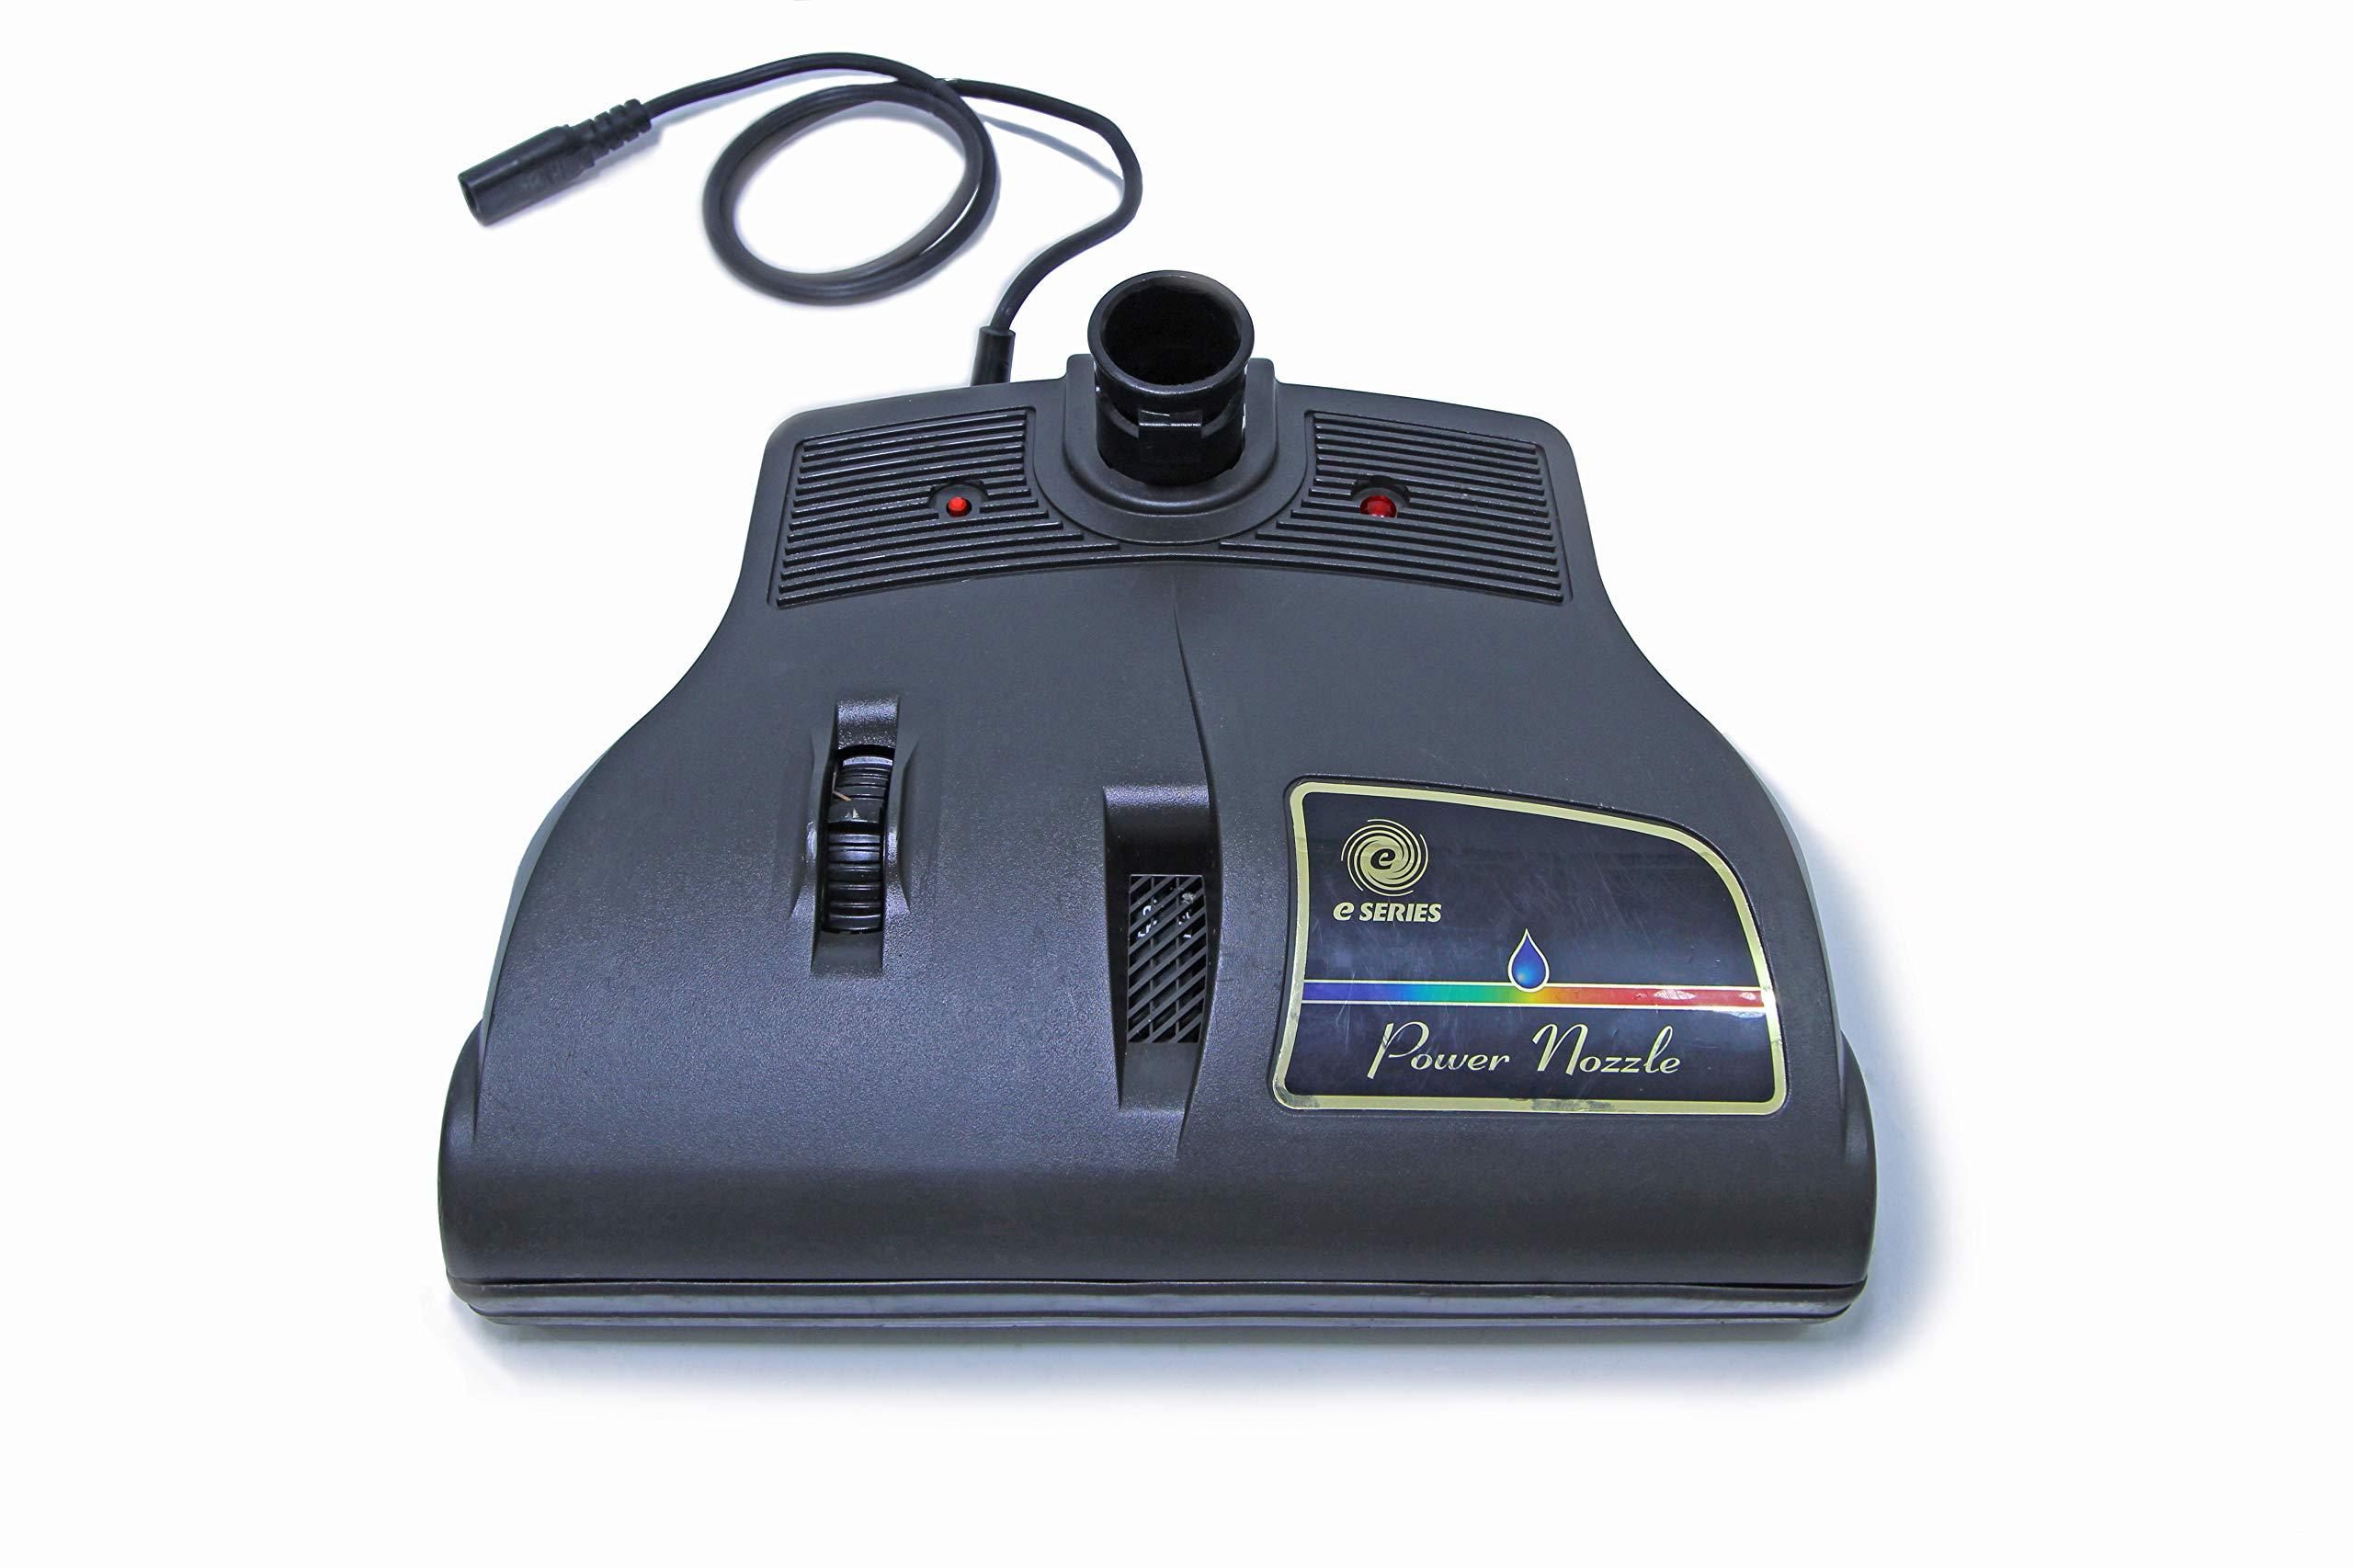 Prolux Rainbow Vacuum Power Head for The E Series (Renewed)